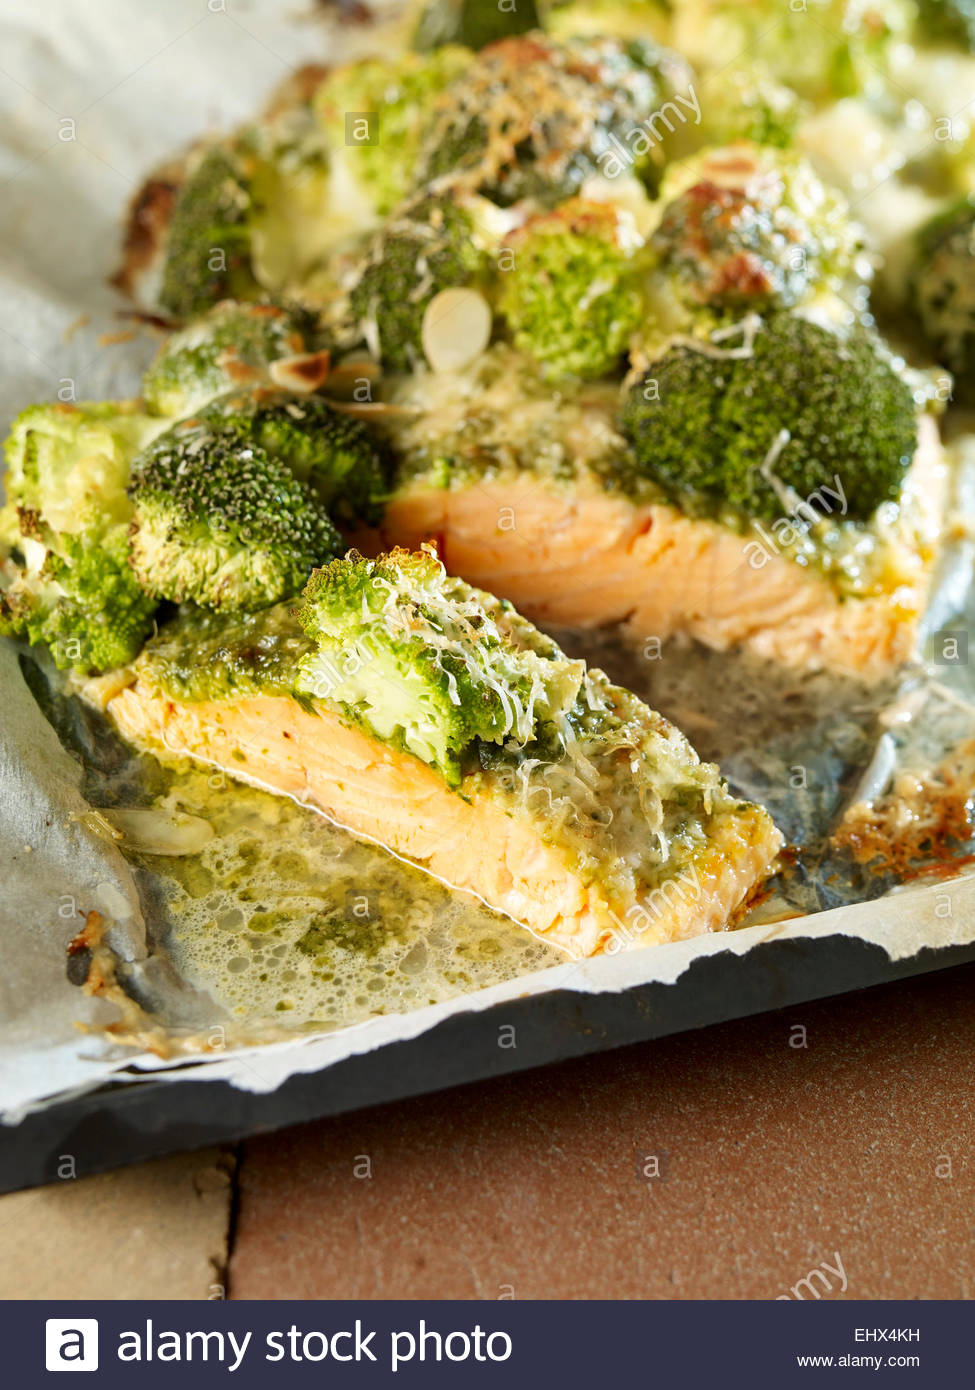 Wild salmon with broccoli and pesto gratinated with parmesan and mozzarella - Stock Image